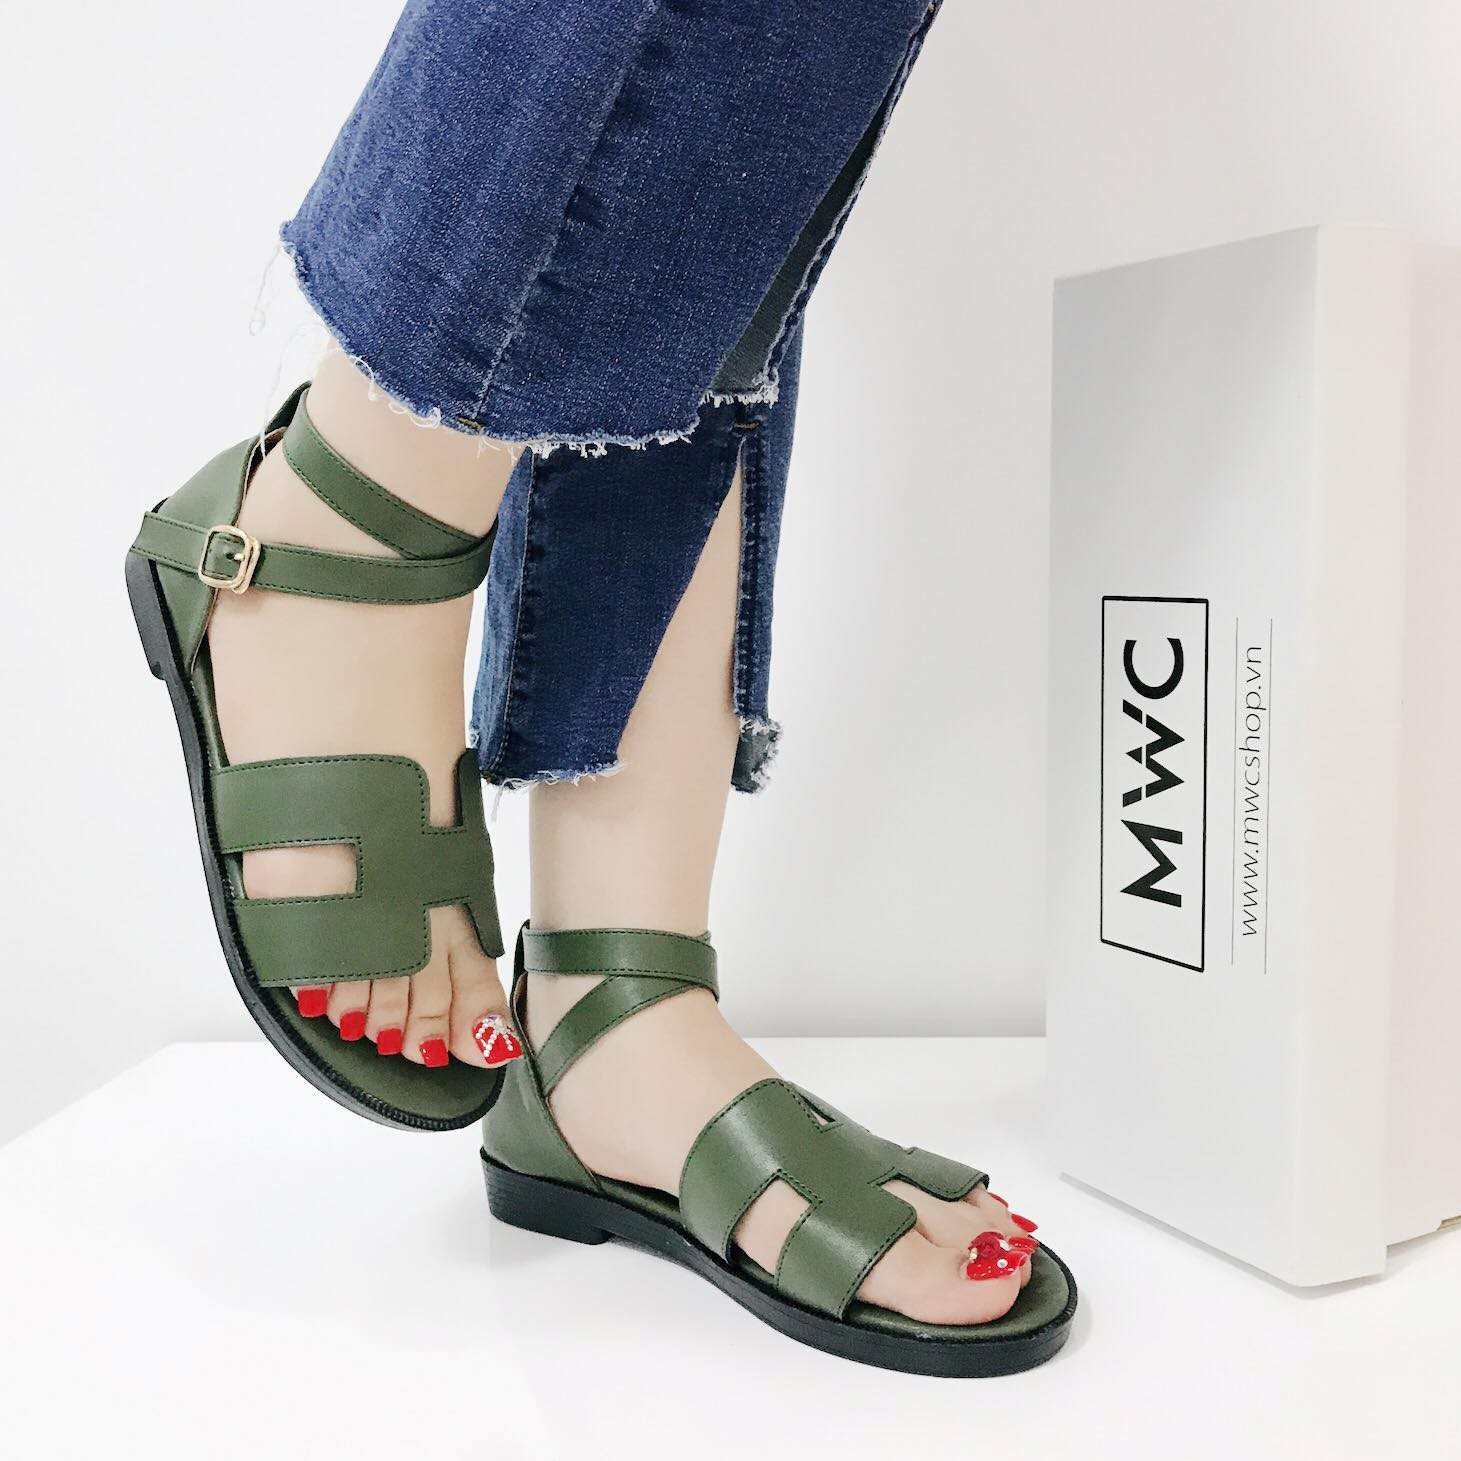 Giày sandal nữ MWC NUSD- 2502